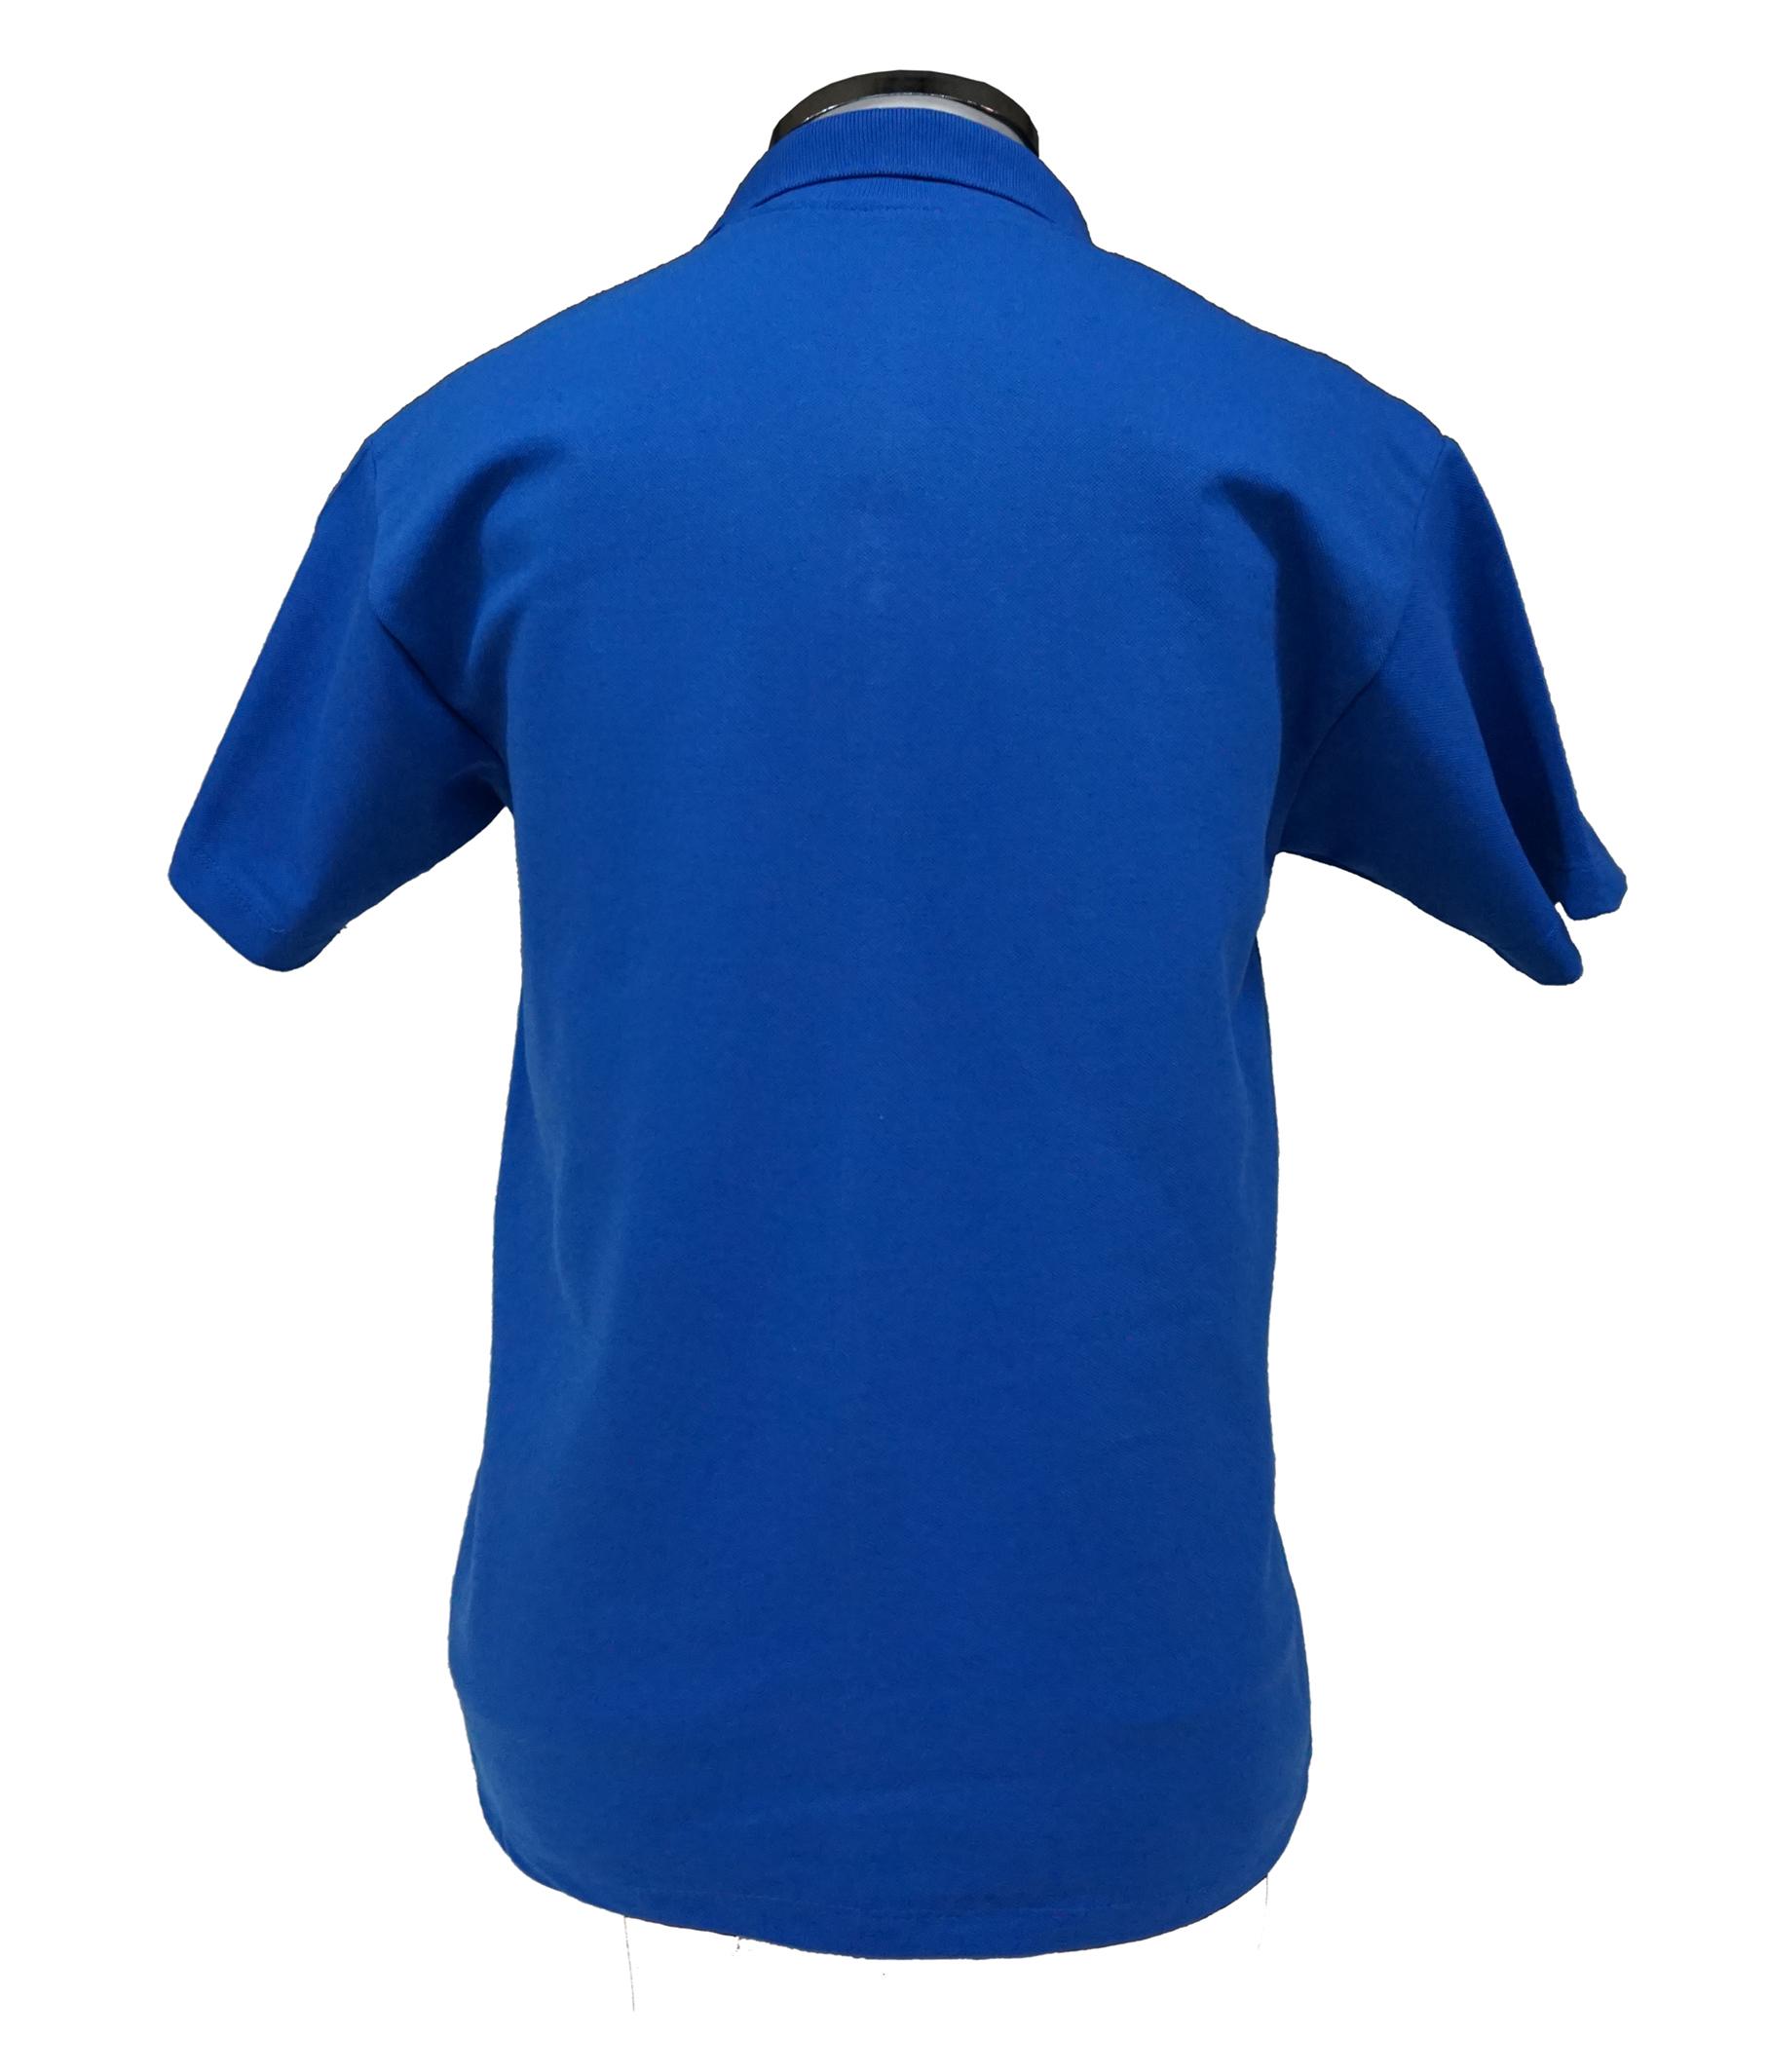 azul 34 costas